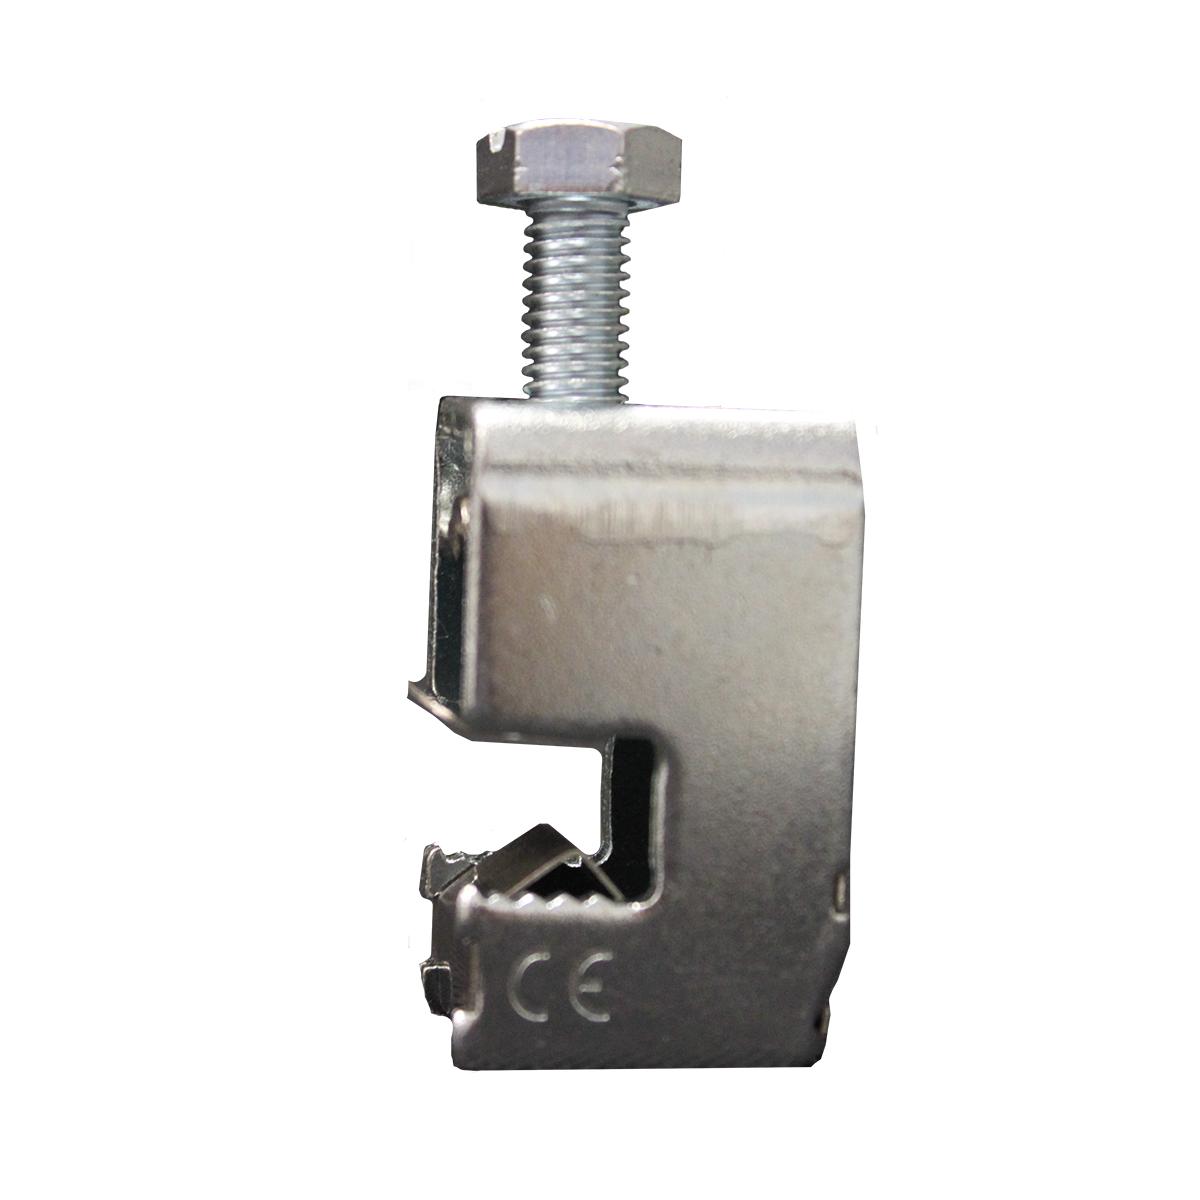 1 Stk Alu-Kupfer-Leiteranschlußklemme 16 -120mm² / 5mm IS5051205-